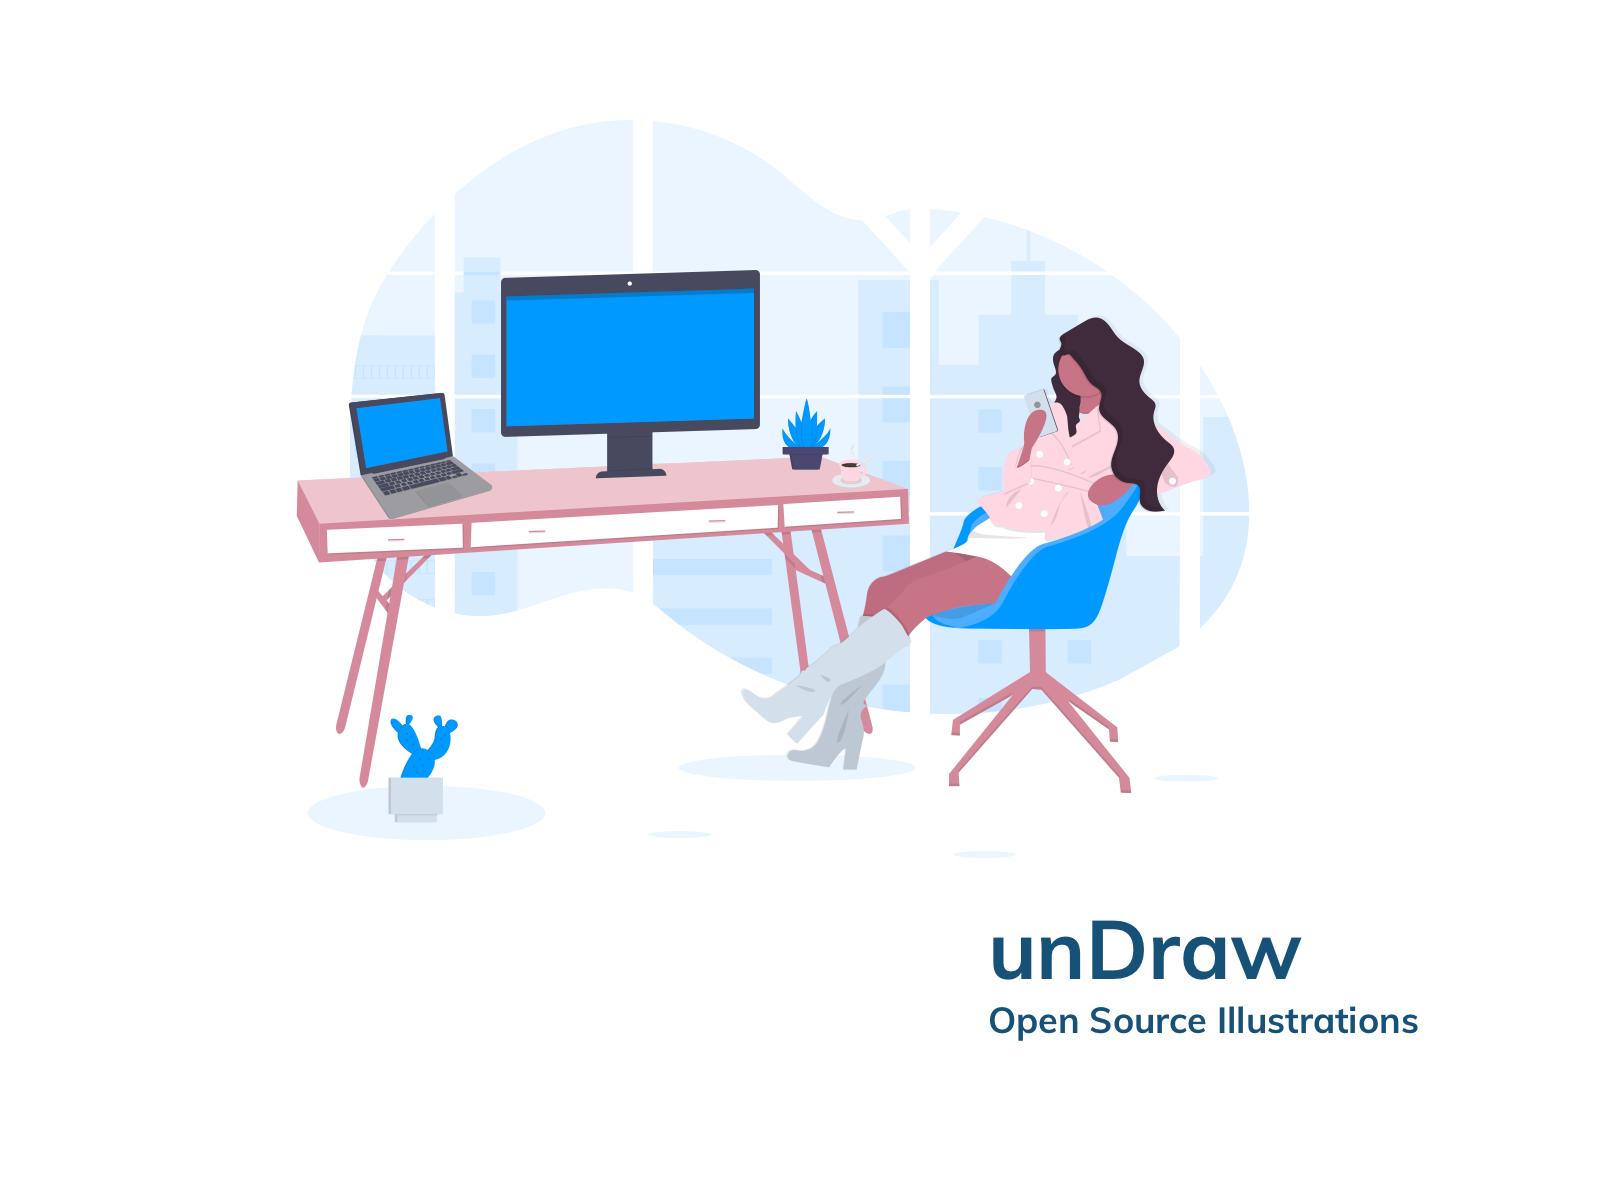 unDraw